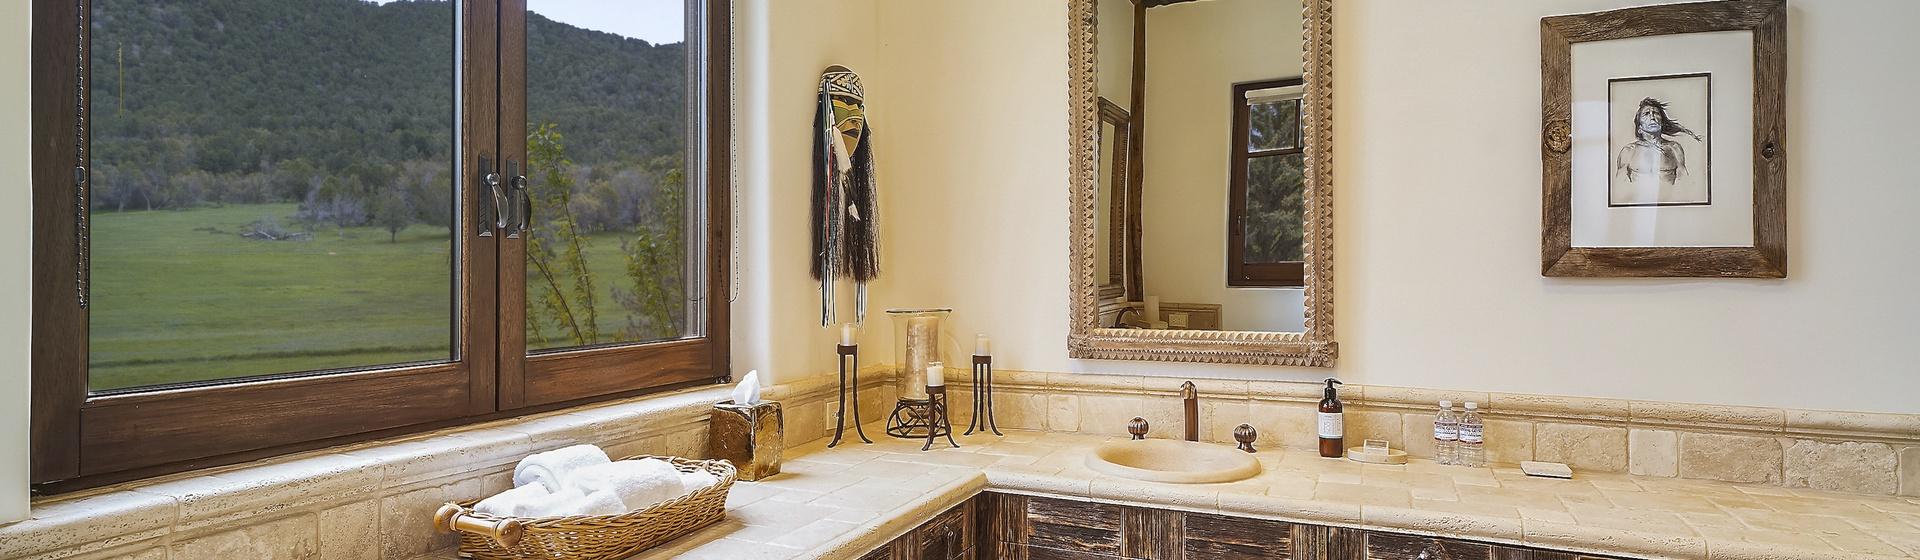 8.9-Telluride-Sleeping-Indian-Ranch-Southwest-Suite-Master-Bathroom-G-2-web.JPG